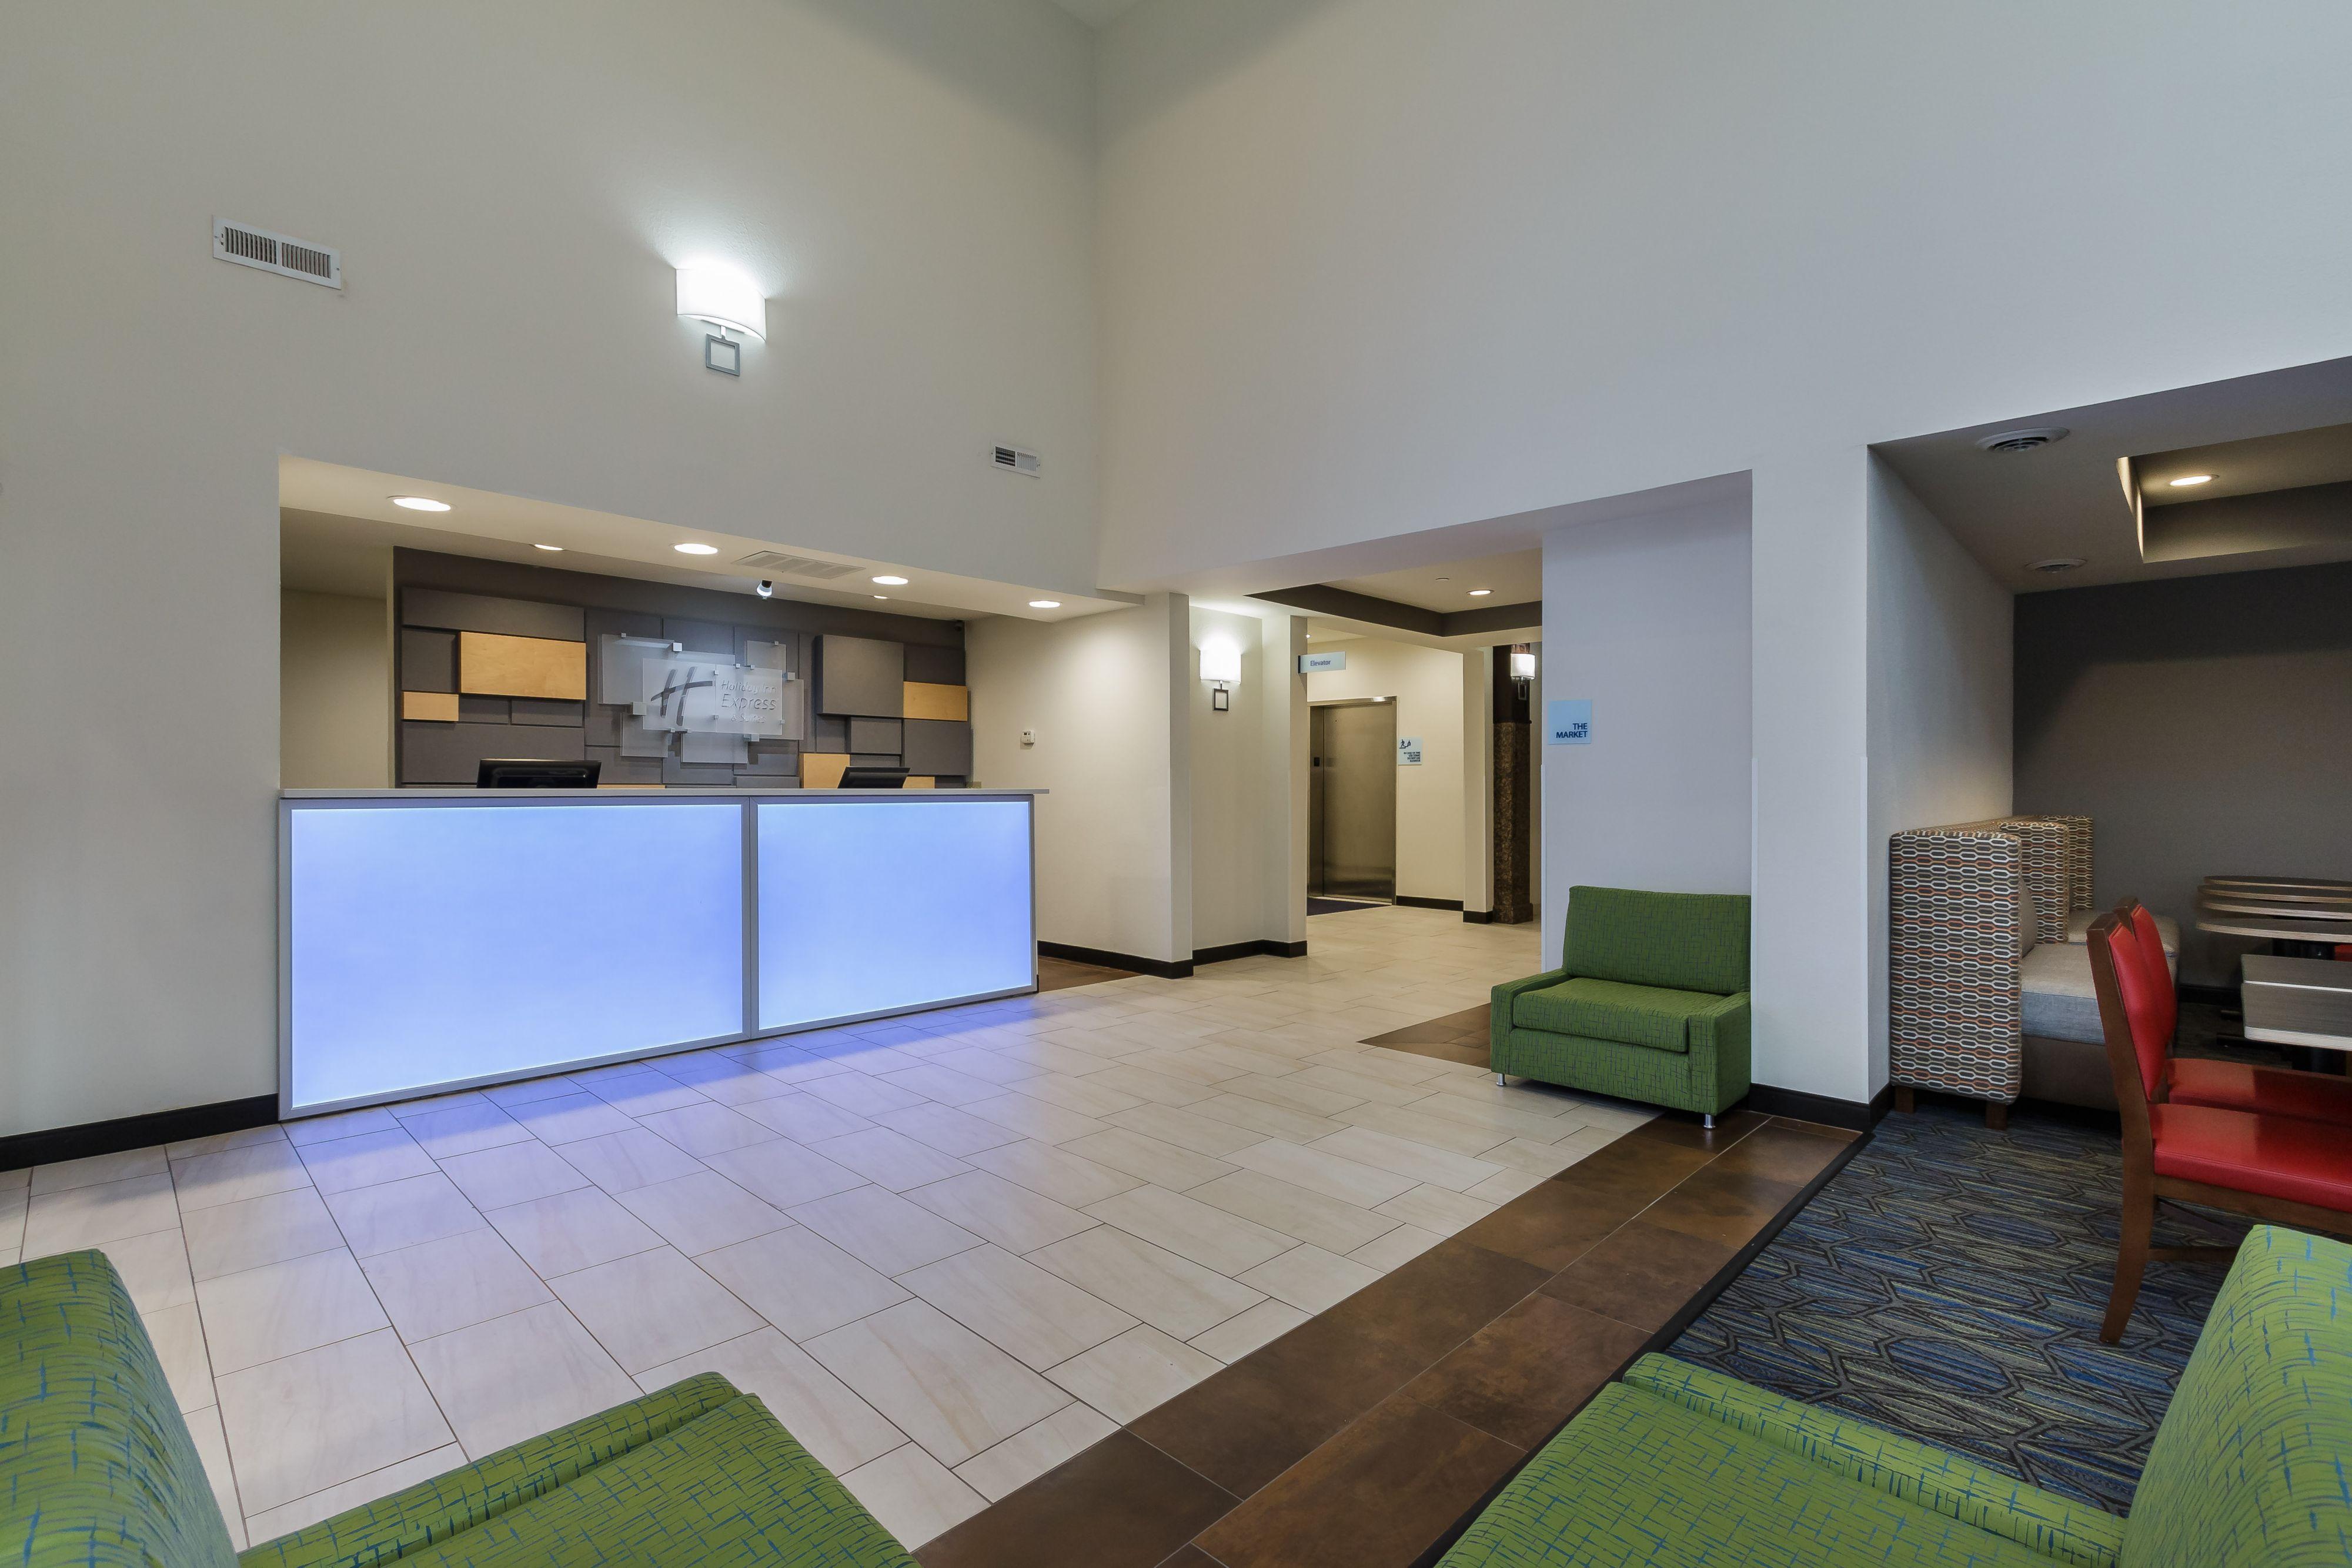 Holiday Inn Express & Suites South Bend - Notre Dame Univ. image 4